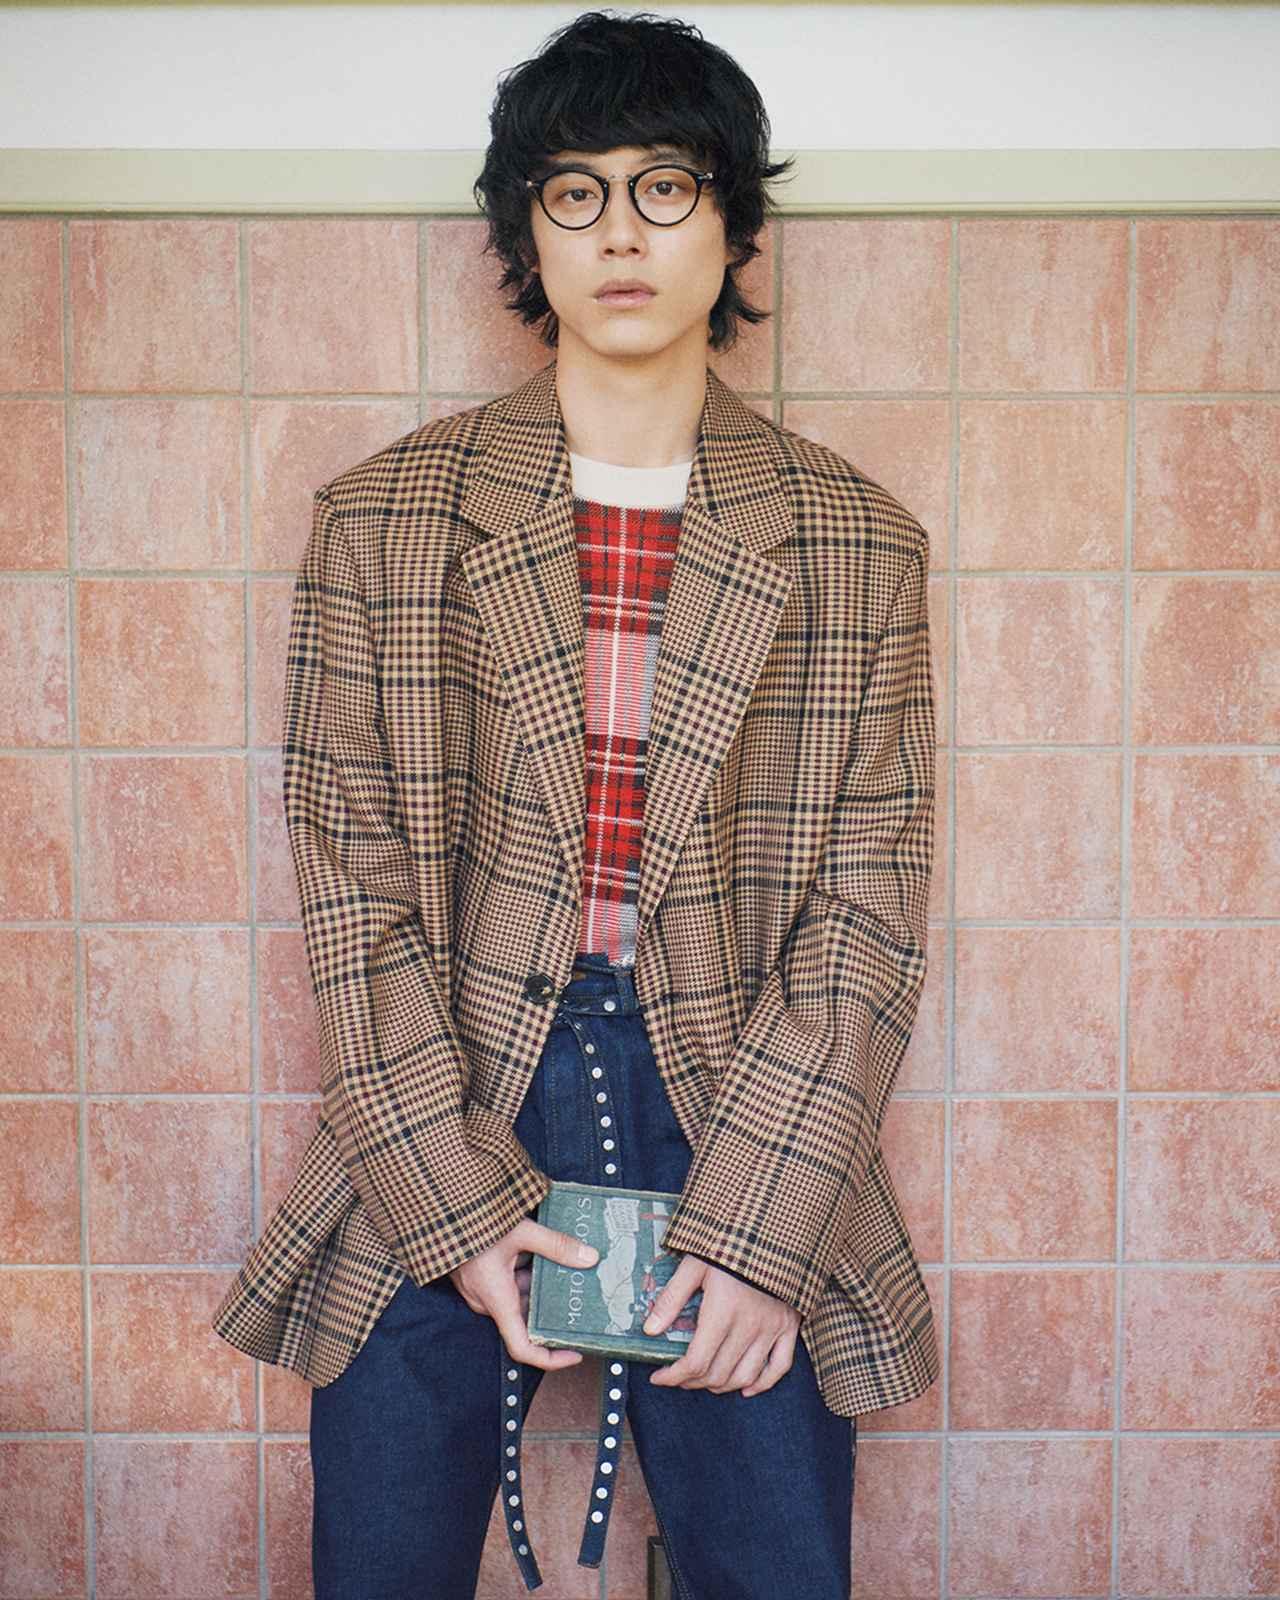 "Images : 3番目の画像 - 「坂口健太郎が語る チェックの服と 役者としての""今""」のアルバム - T JAPAN:The New York Times Style Magazine 公式サイト"